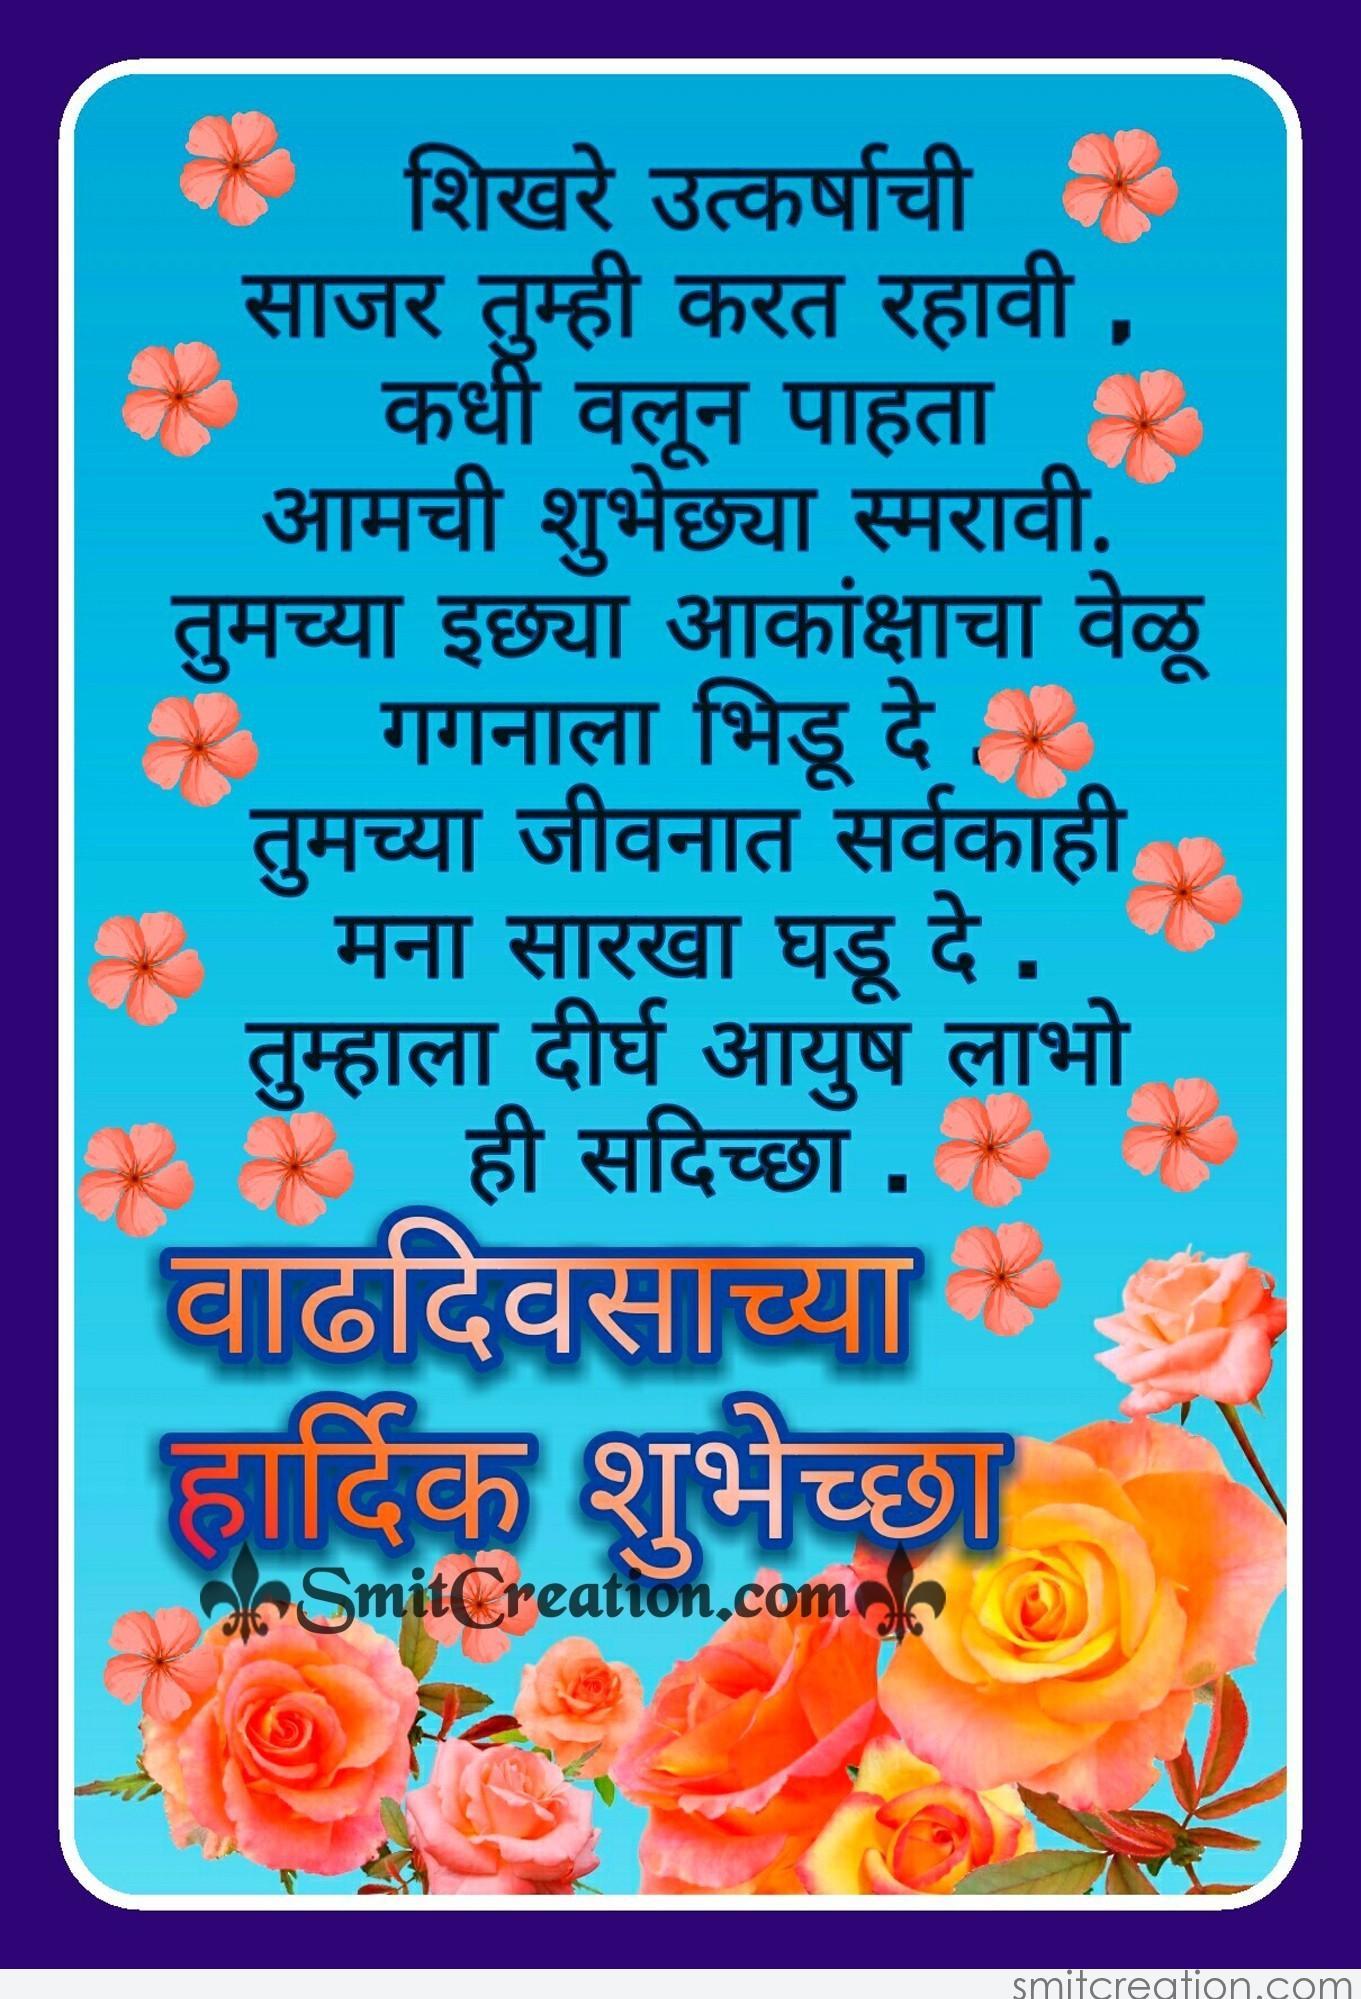 Birthday Marathi Pictures and Graphics - SmitCreation.com Vadhdivas Chya Hardik Shubhechha